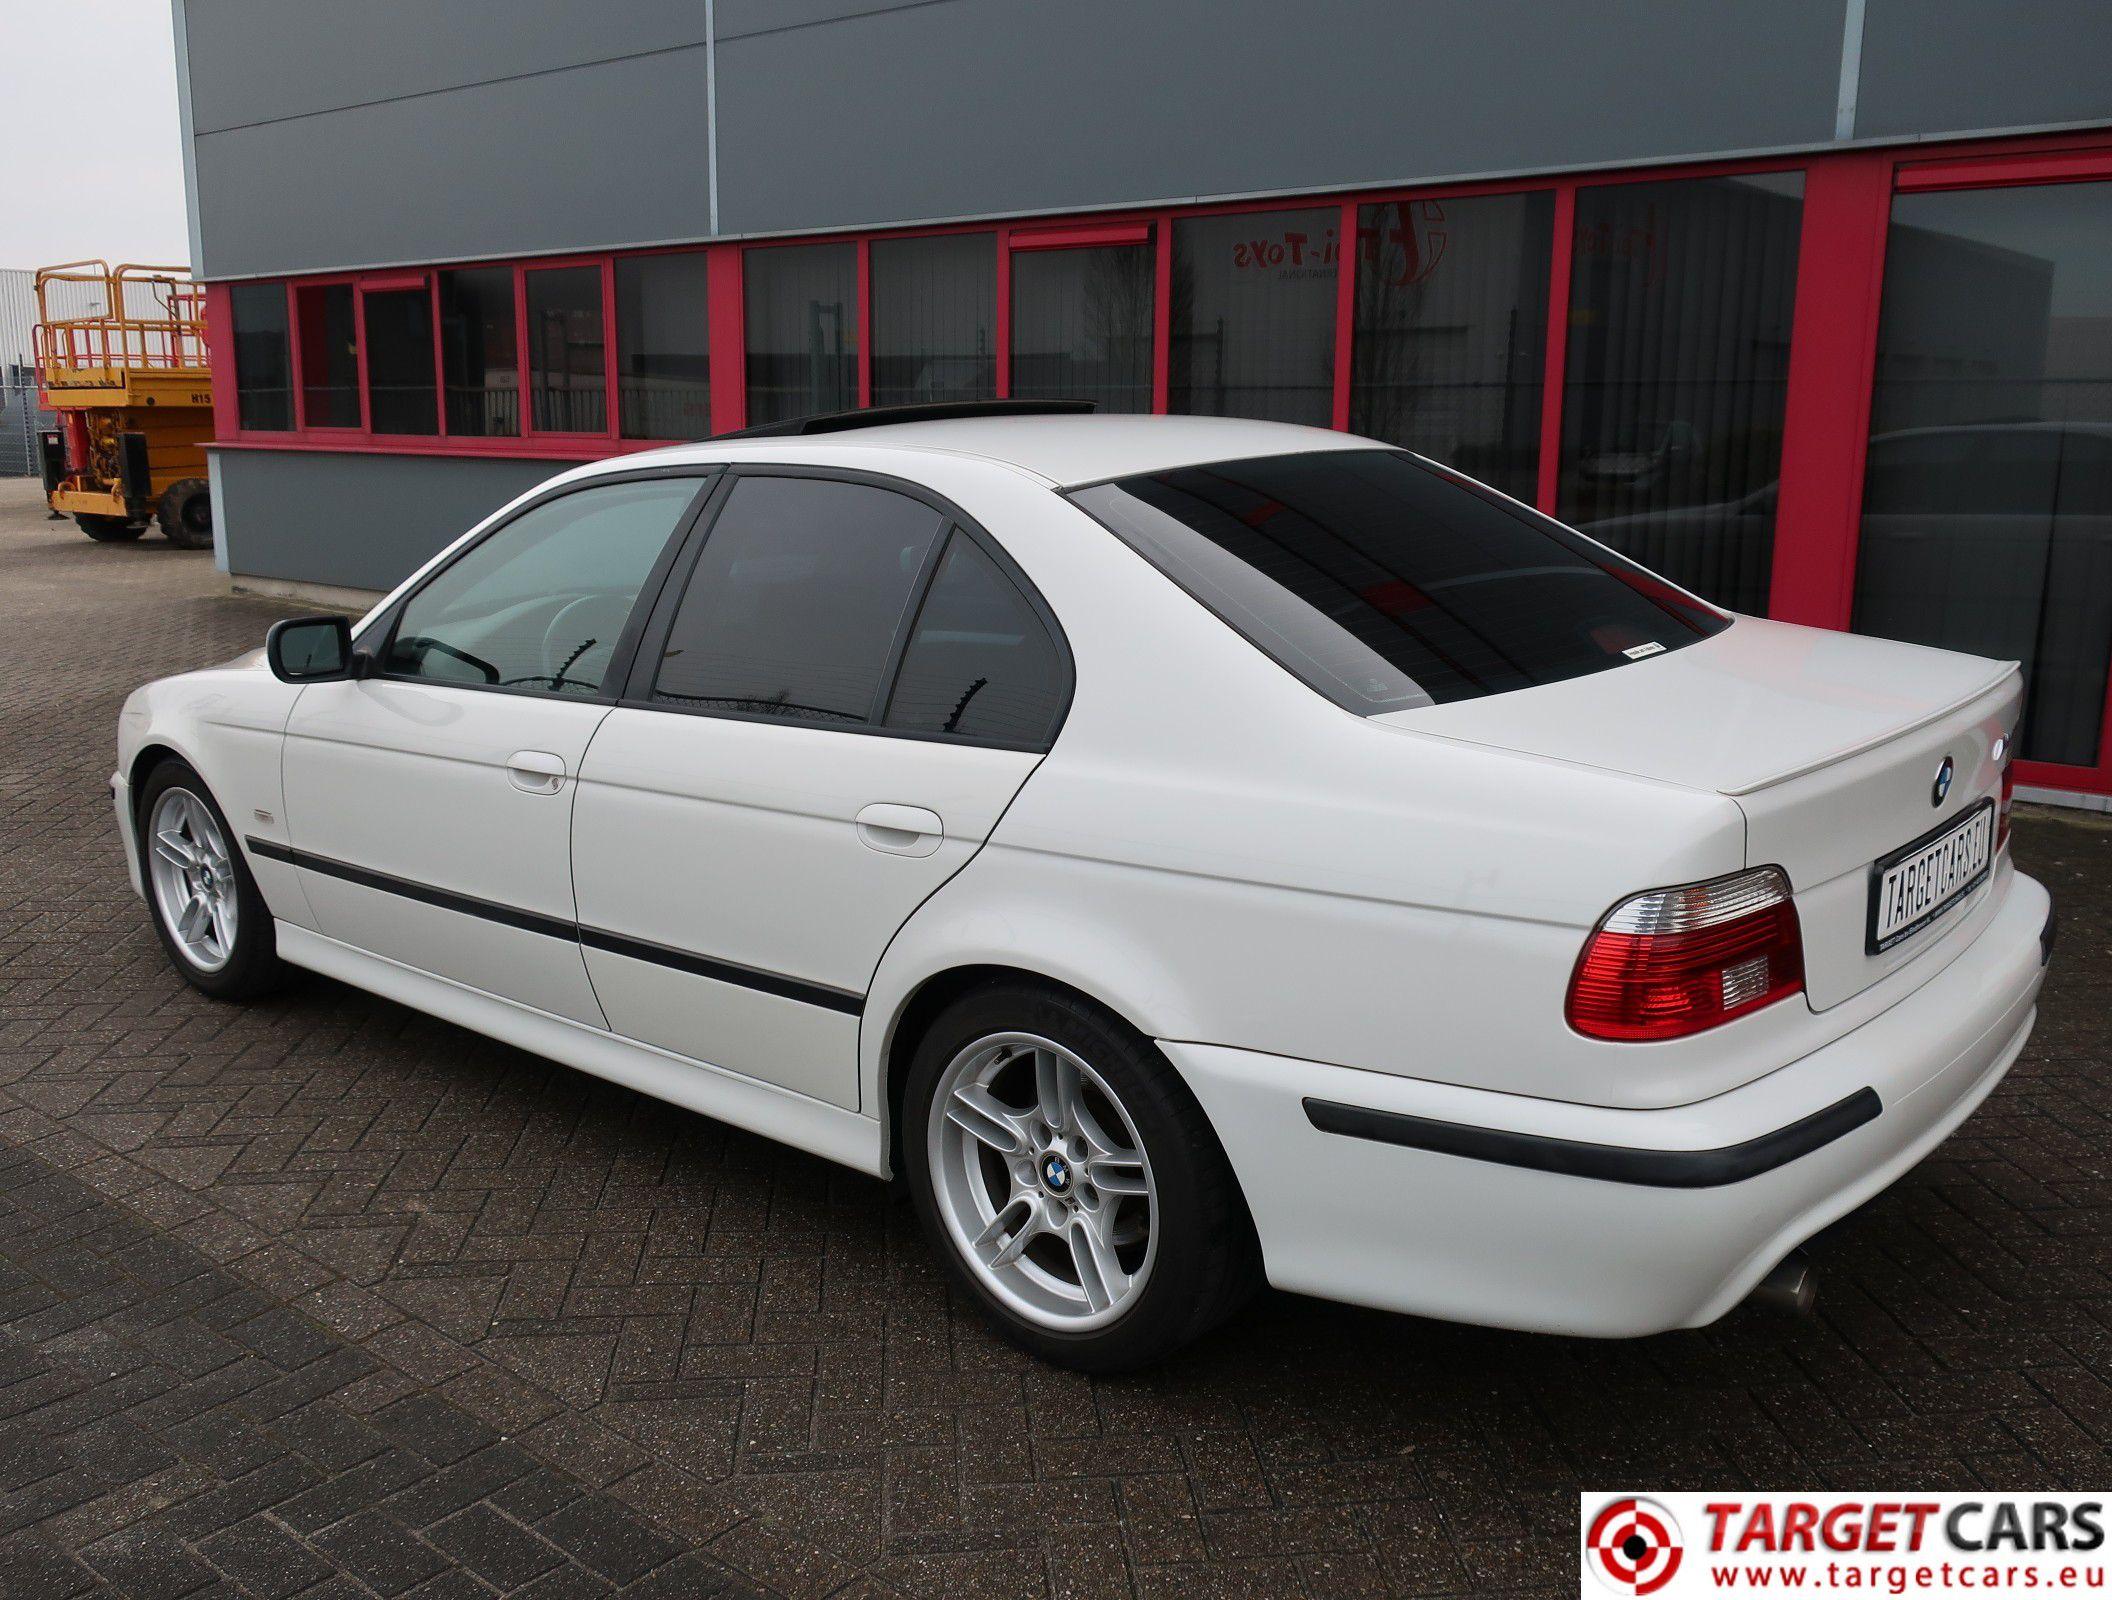 BMW 525I E39 SEDAN 2 5L 192HP AUT M-SPORT 03-01 WHITE 119394KM LHD